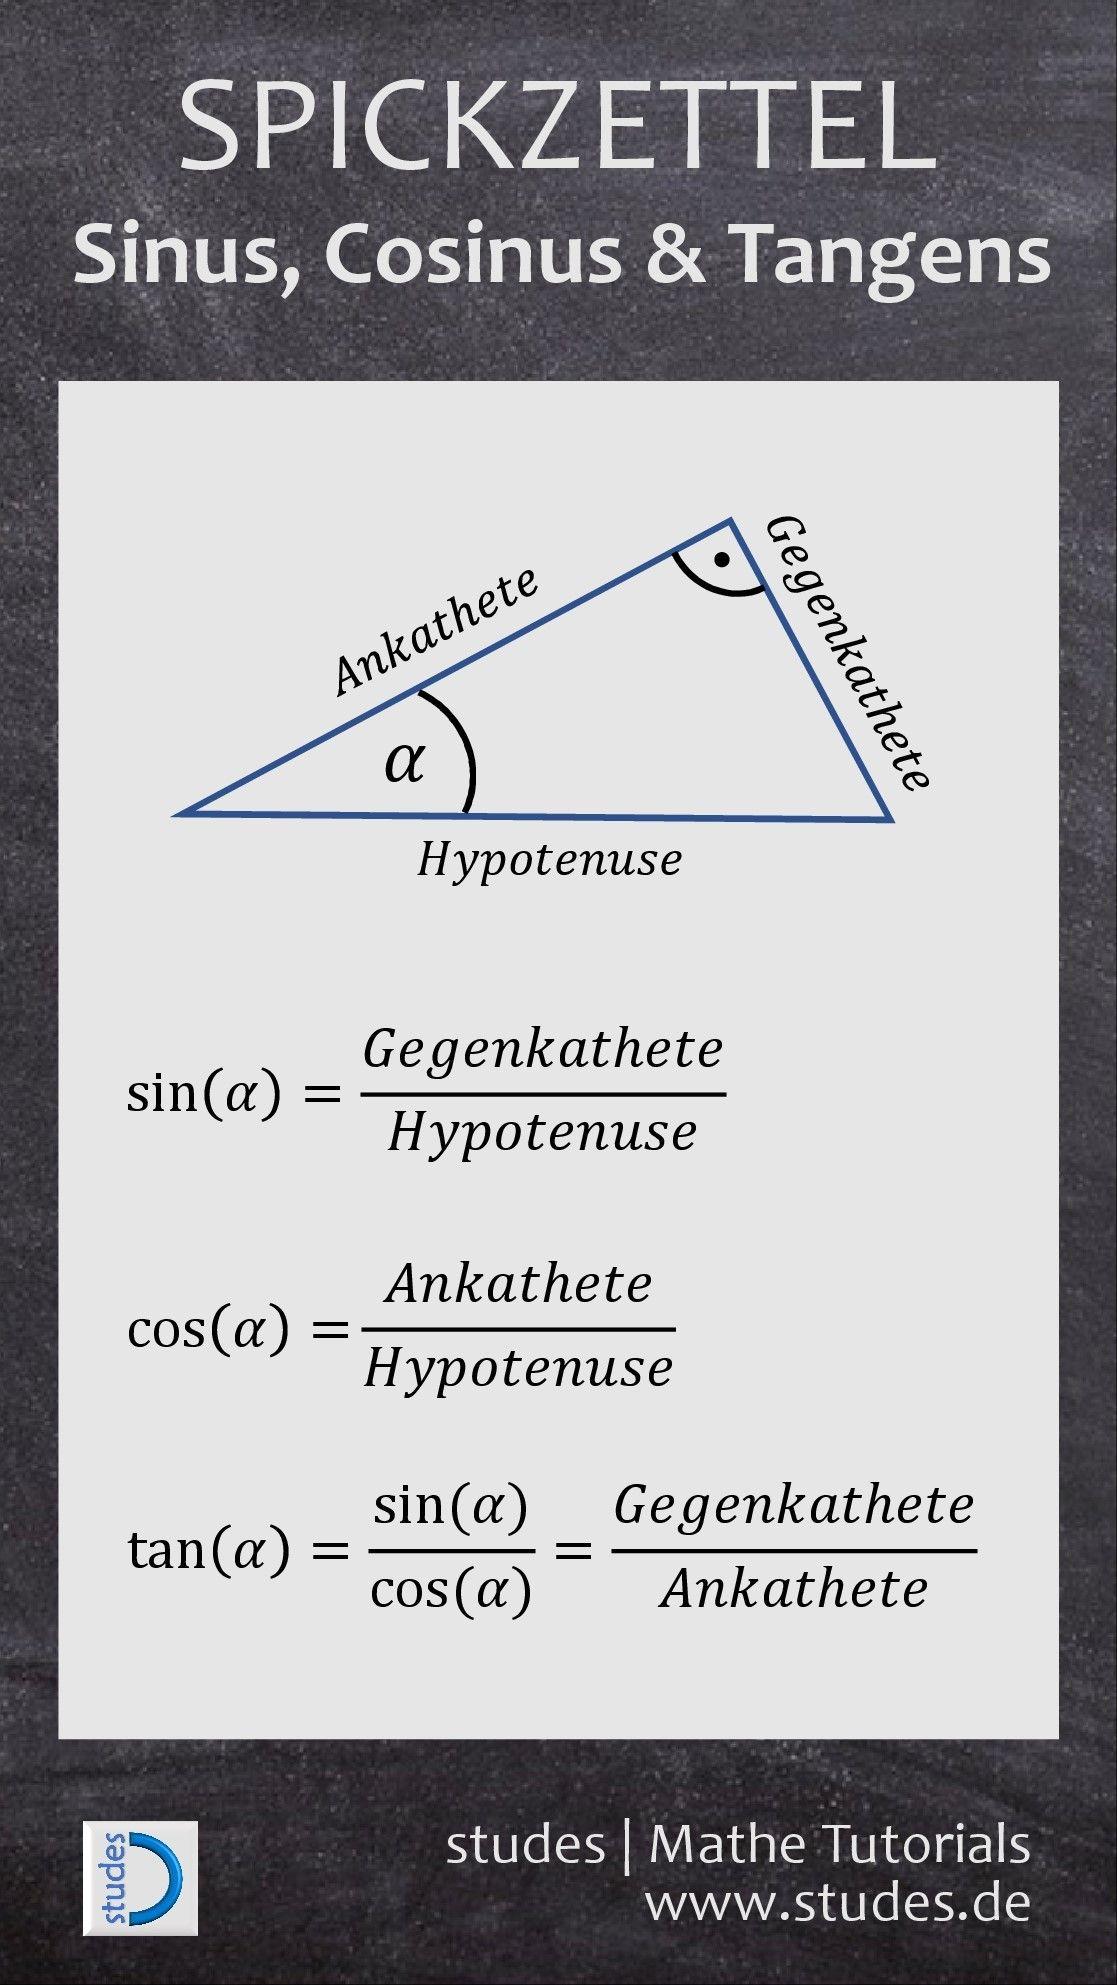 Sinus-Cosinus-Tangens | Mathe Spicker | Pinterest | Mathe, Schule ...